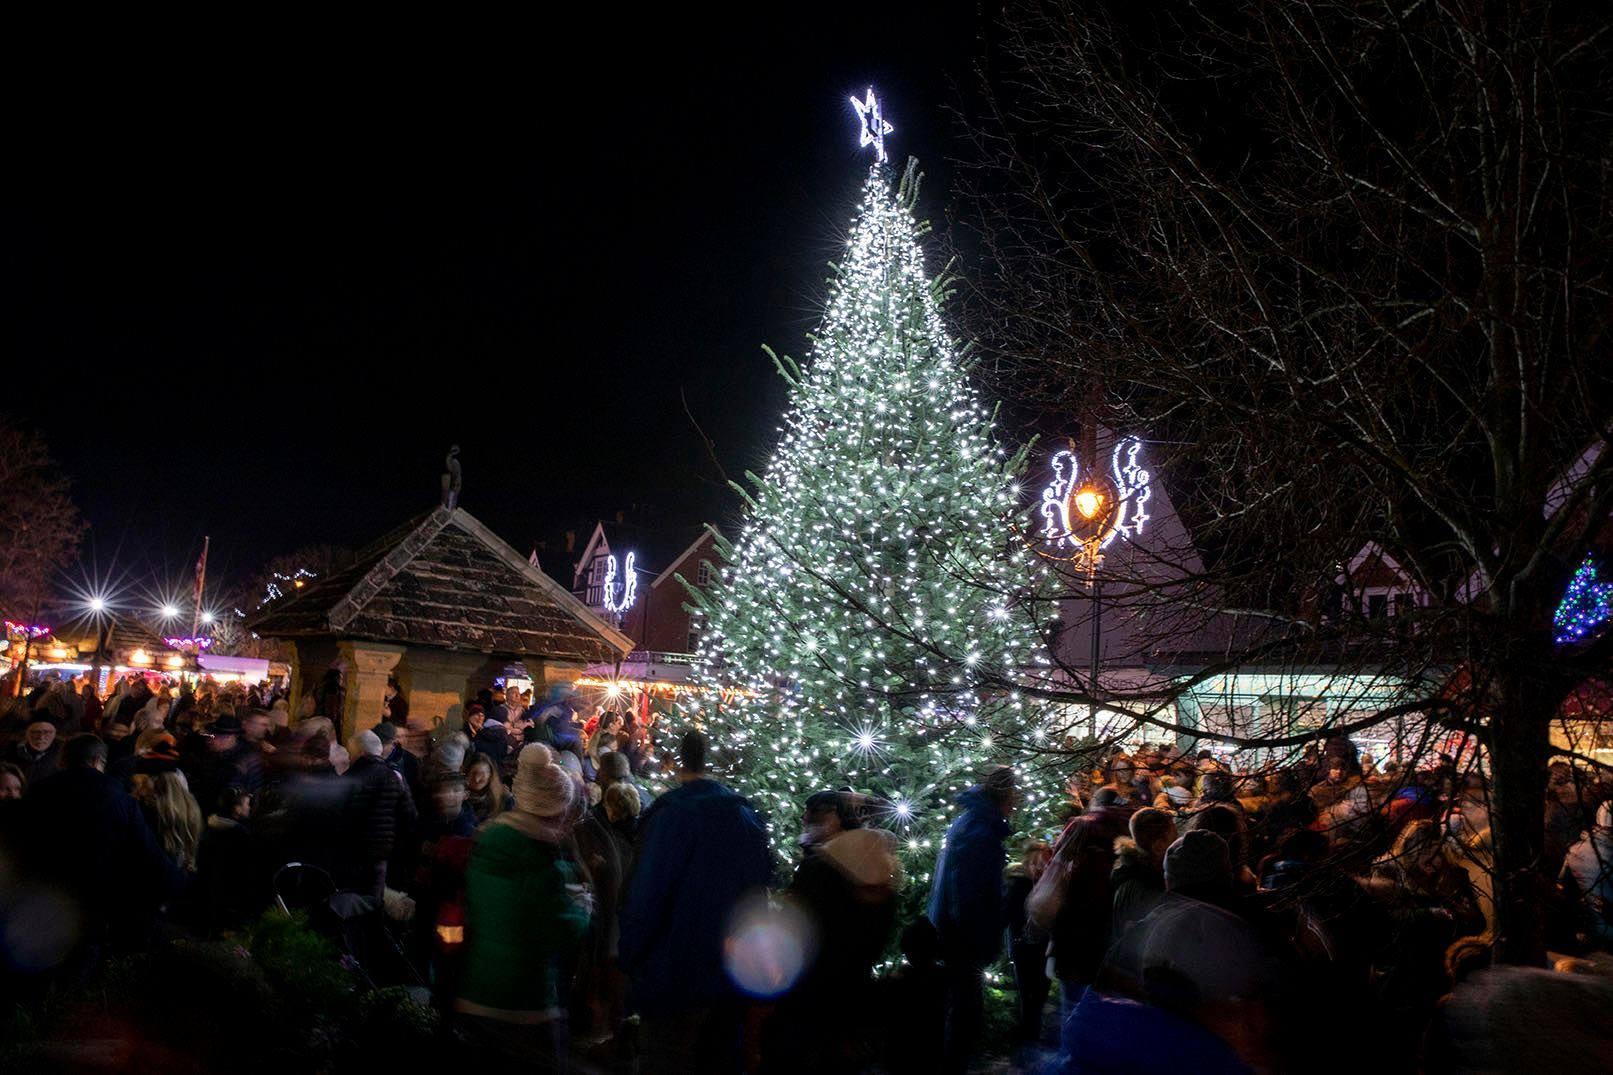 Cranleigh Christmas lights set for a spectacular year